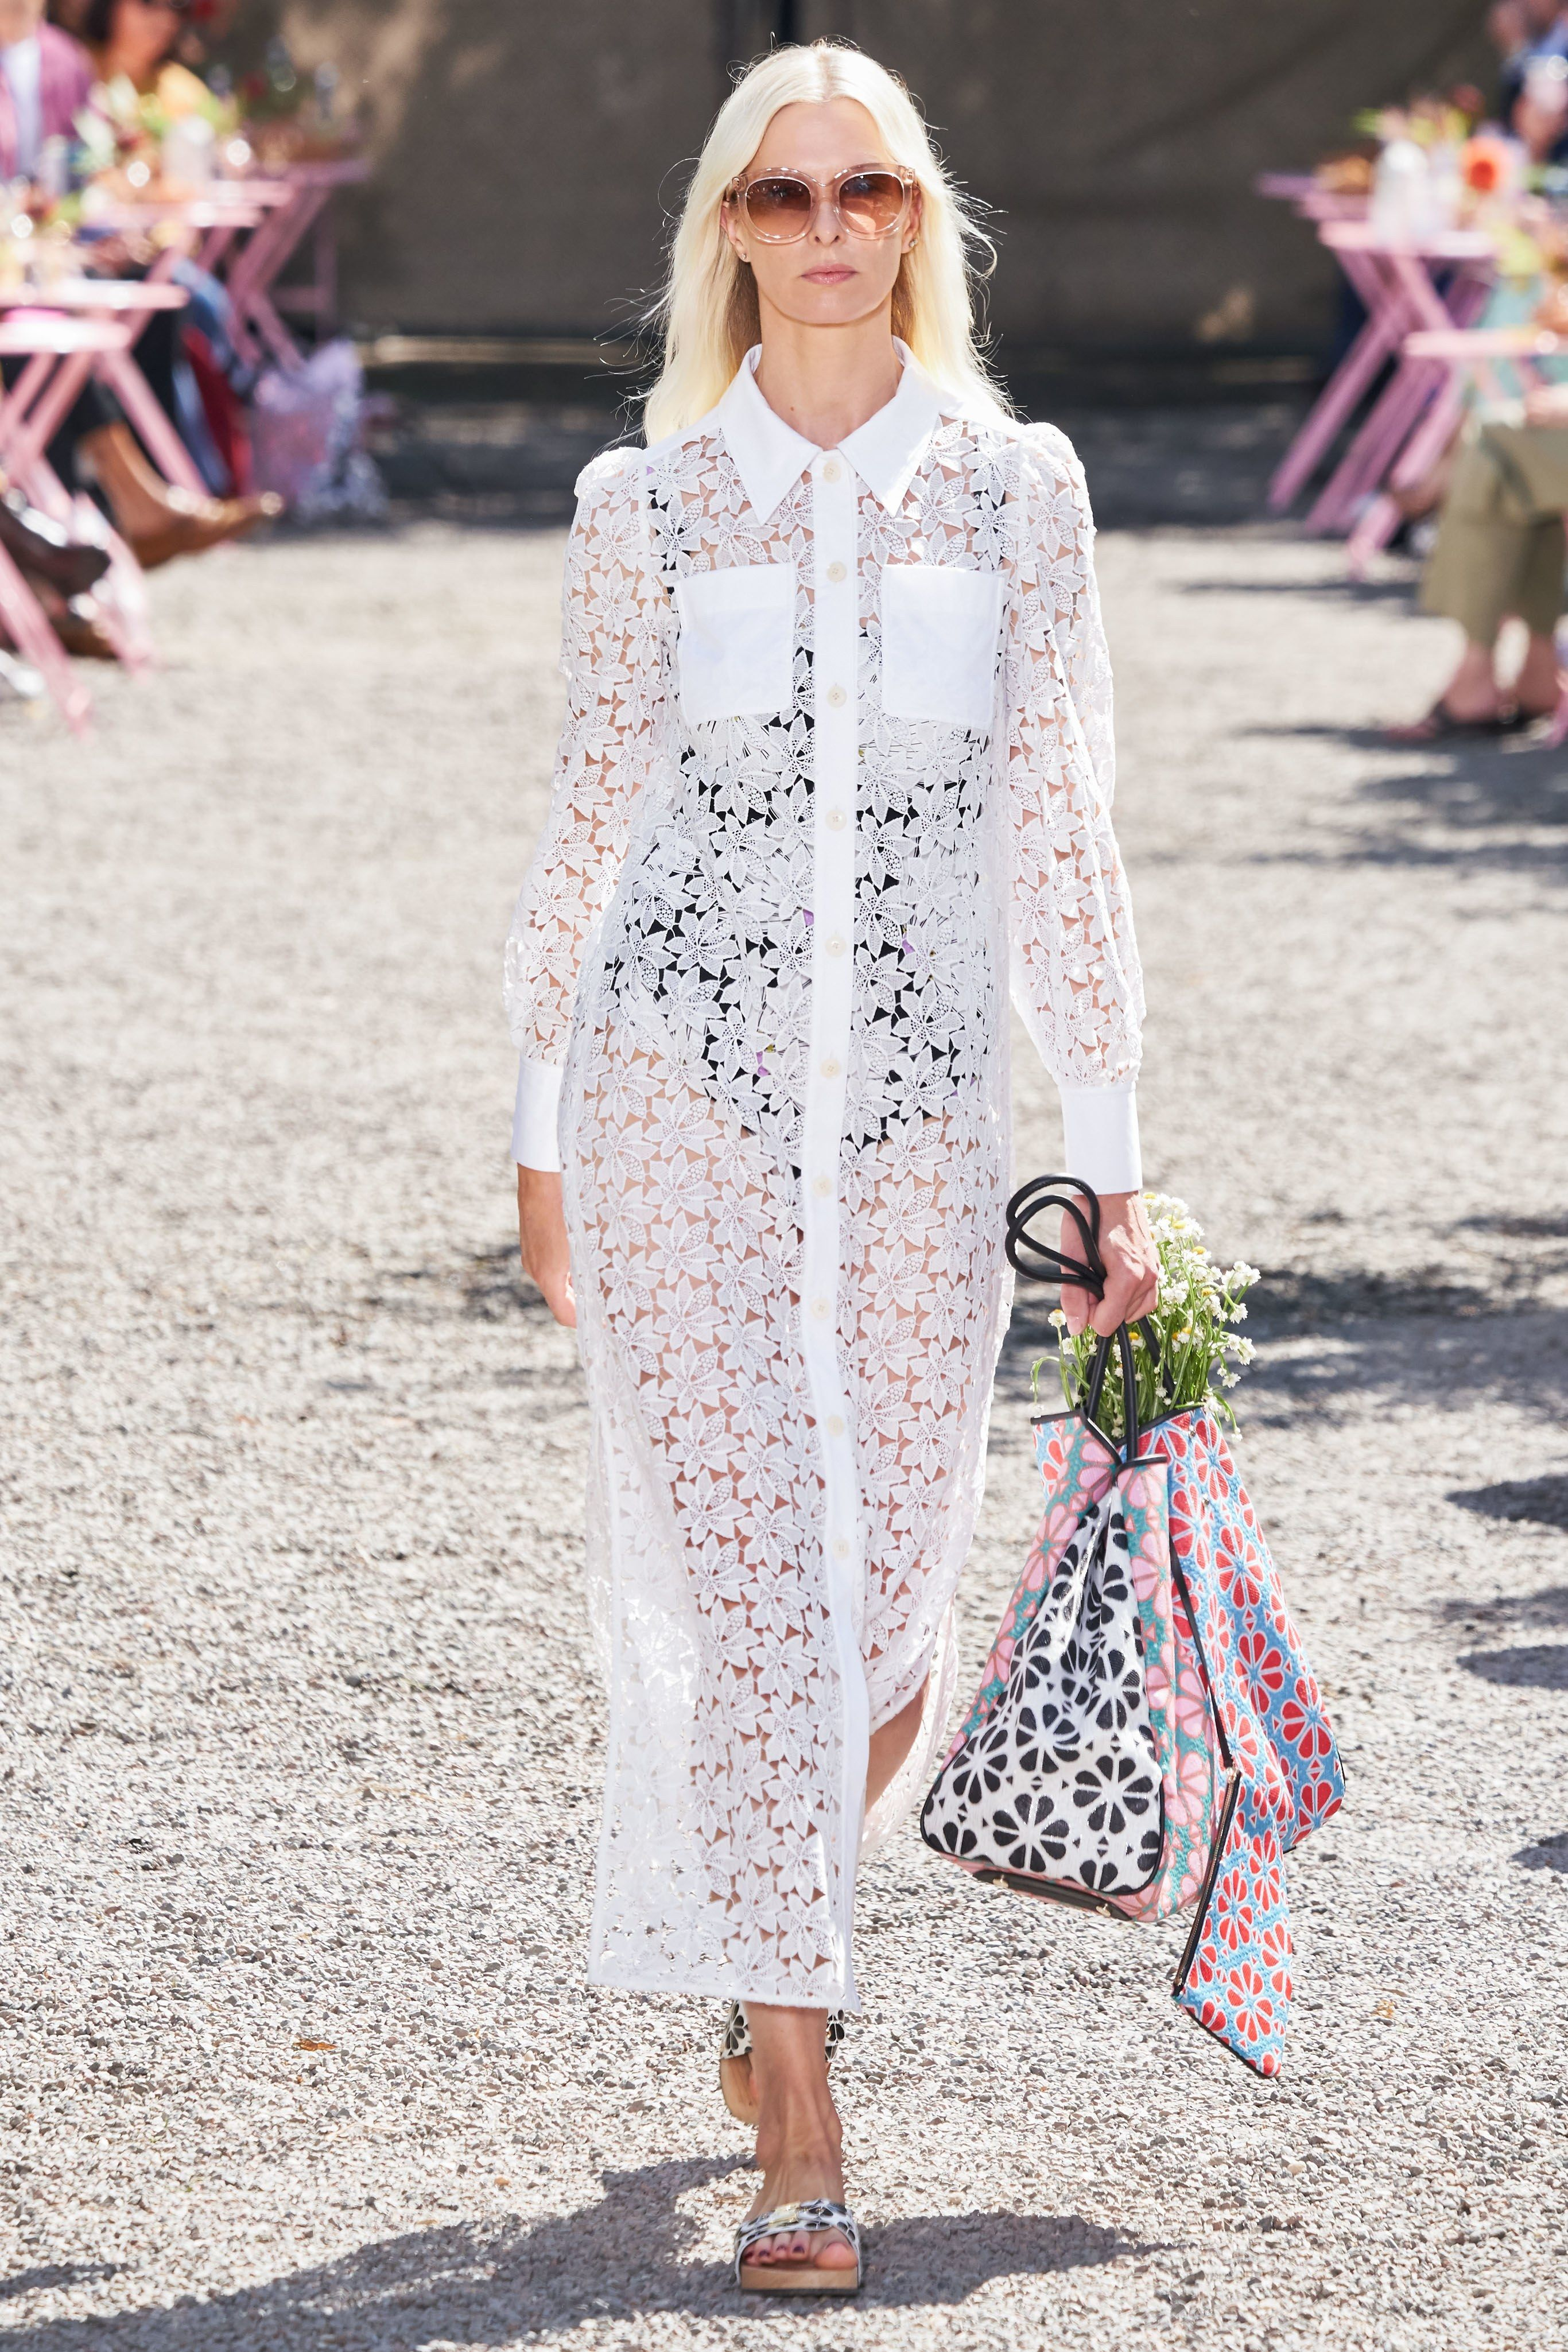 I Want That Bouquet In 2020 New York Fashion Fashion Show Fashion